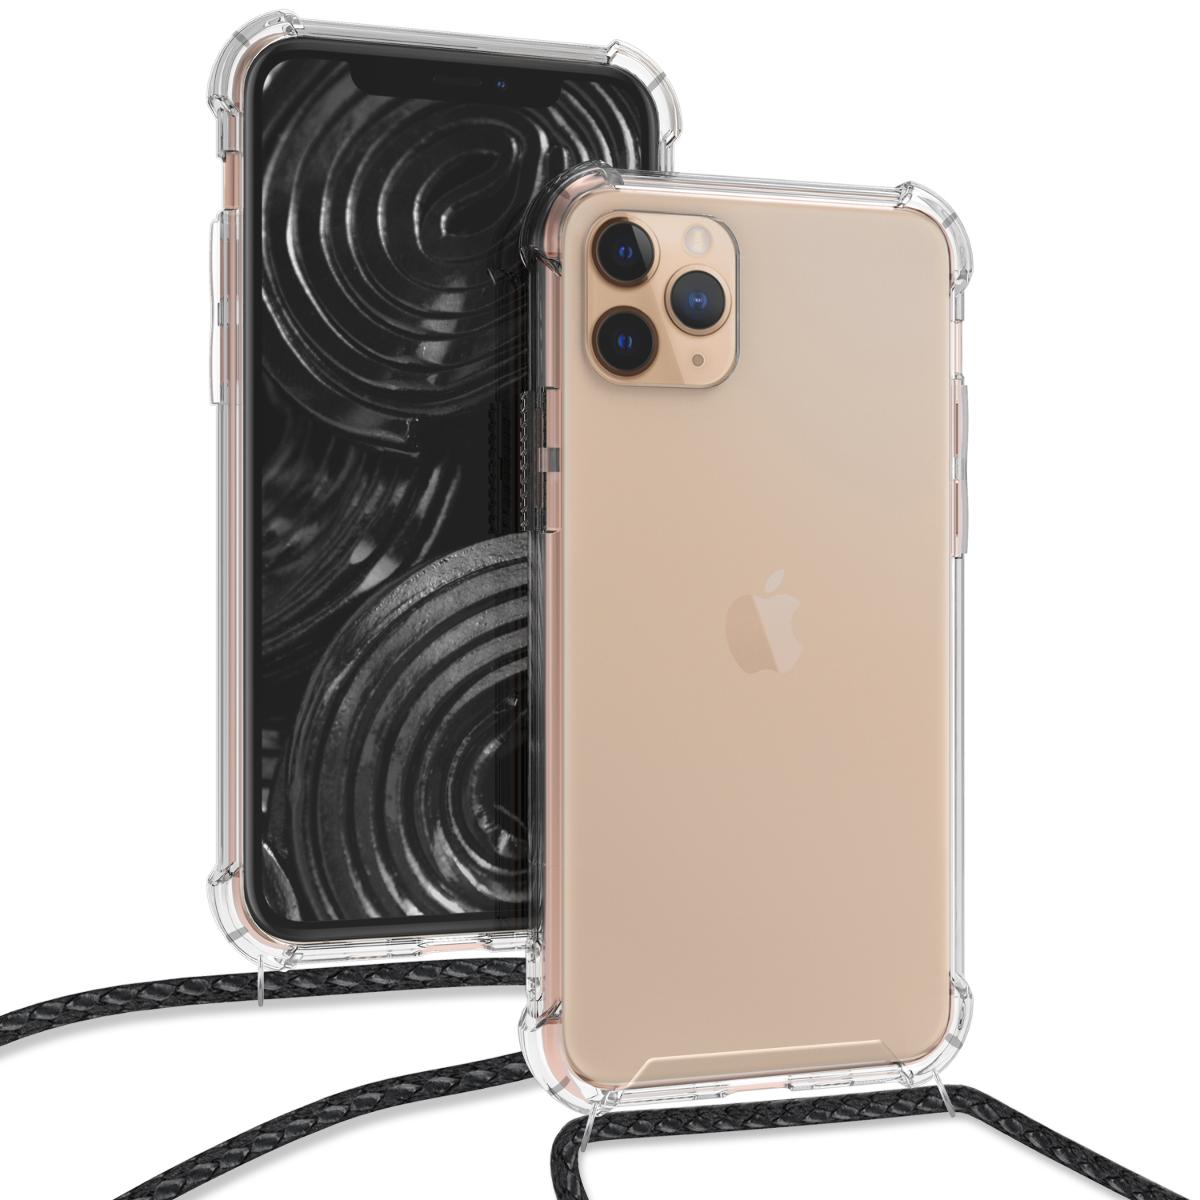 KW Θήκη Σιλικόνης με Λουράκι Λαιμού Apple iPhone 11 Pro - Transparent (50635.03)